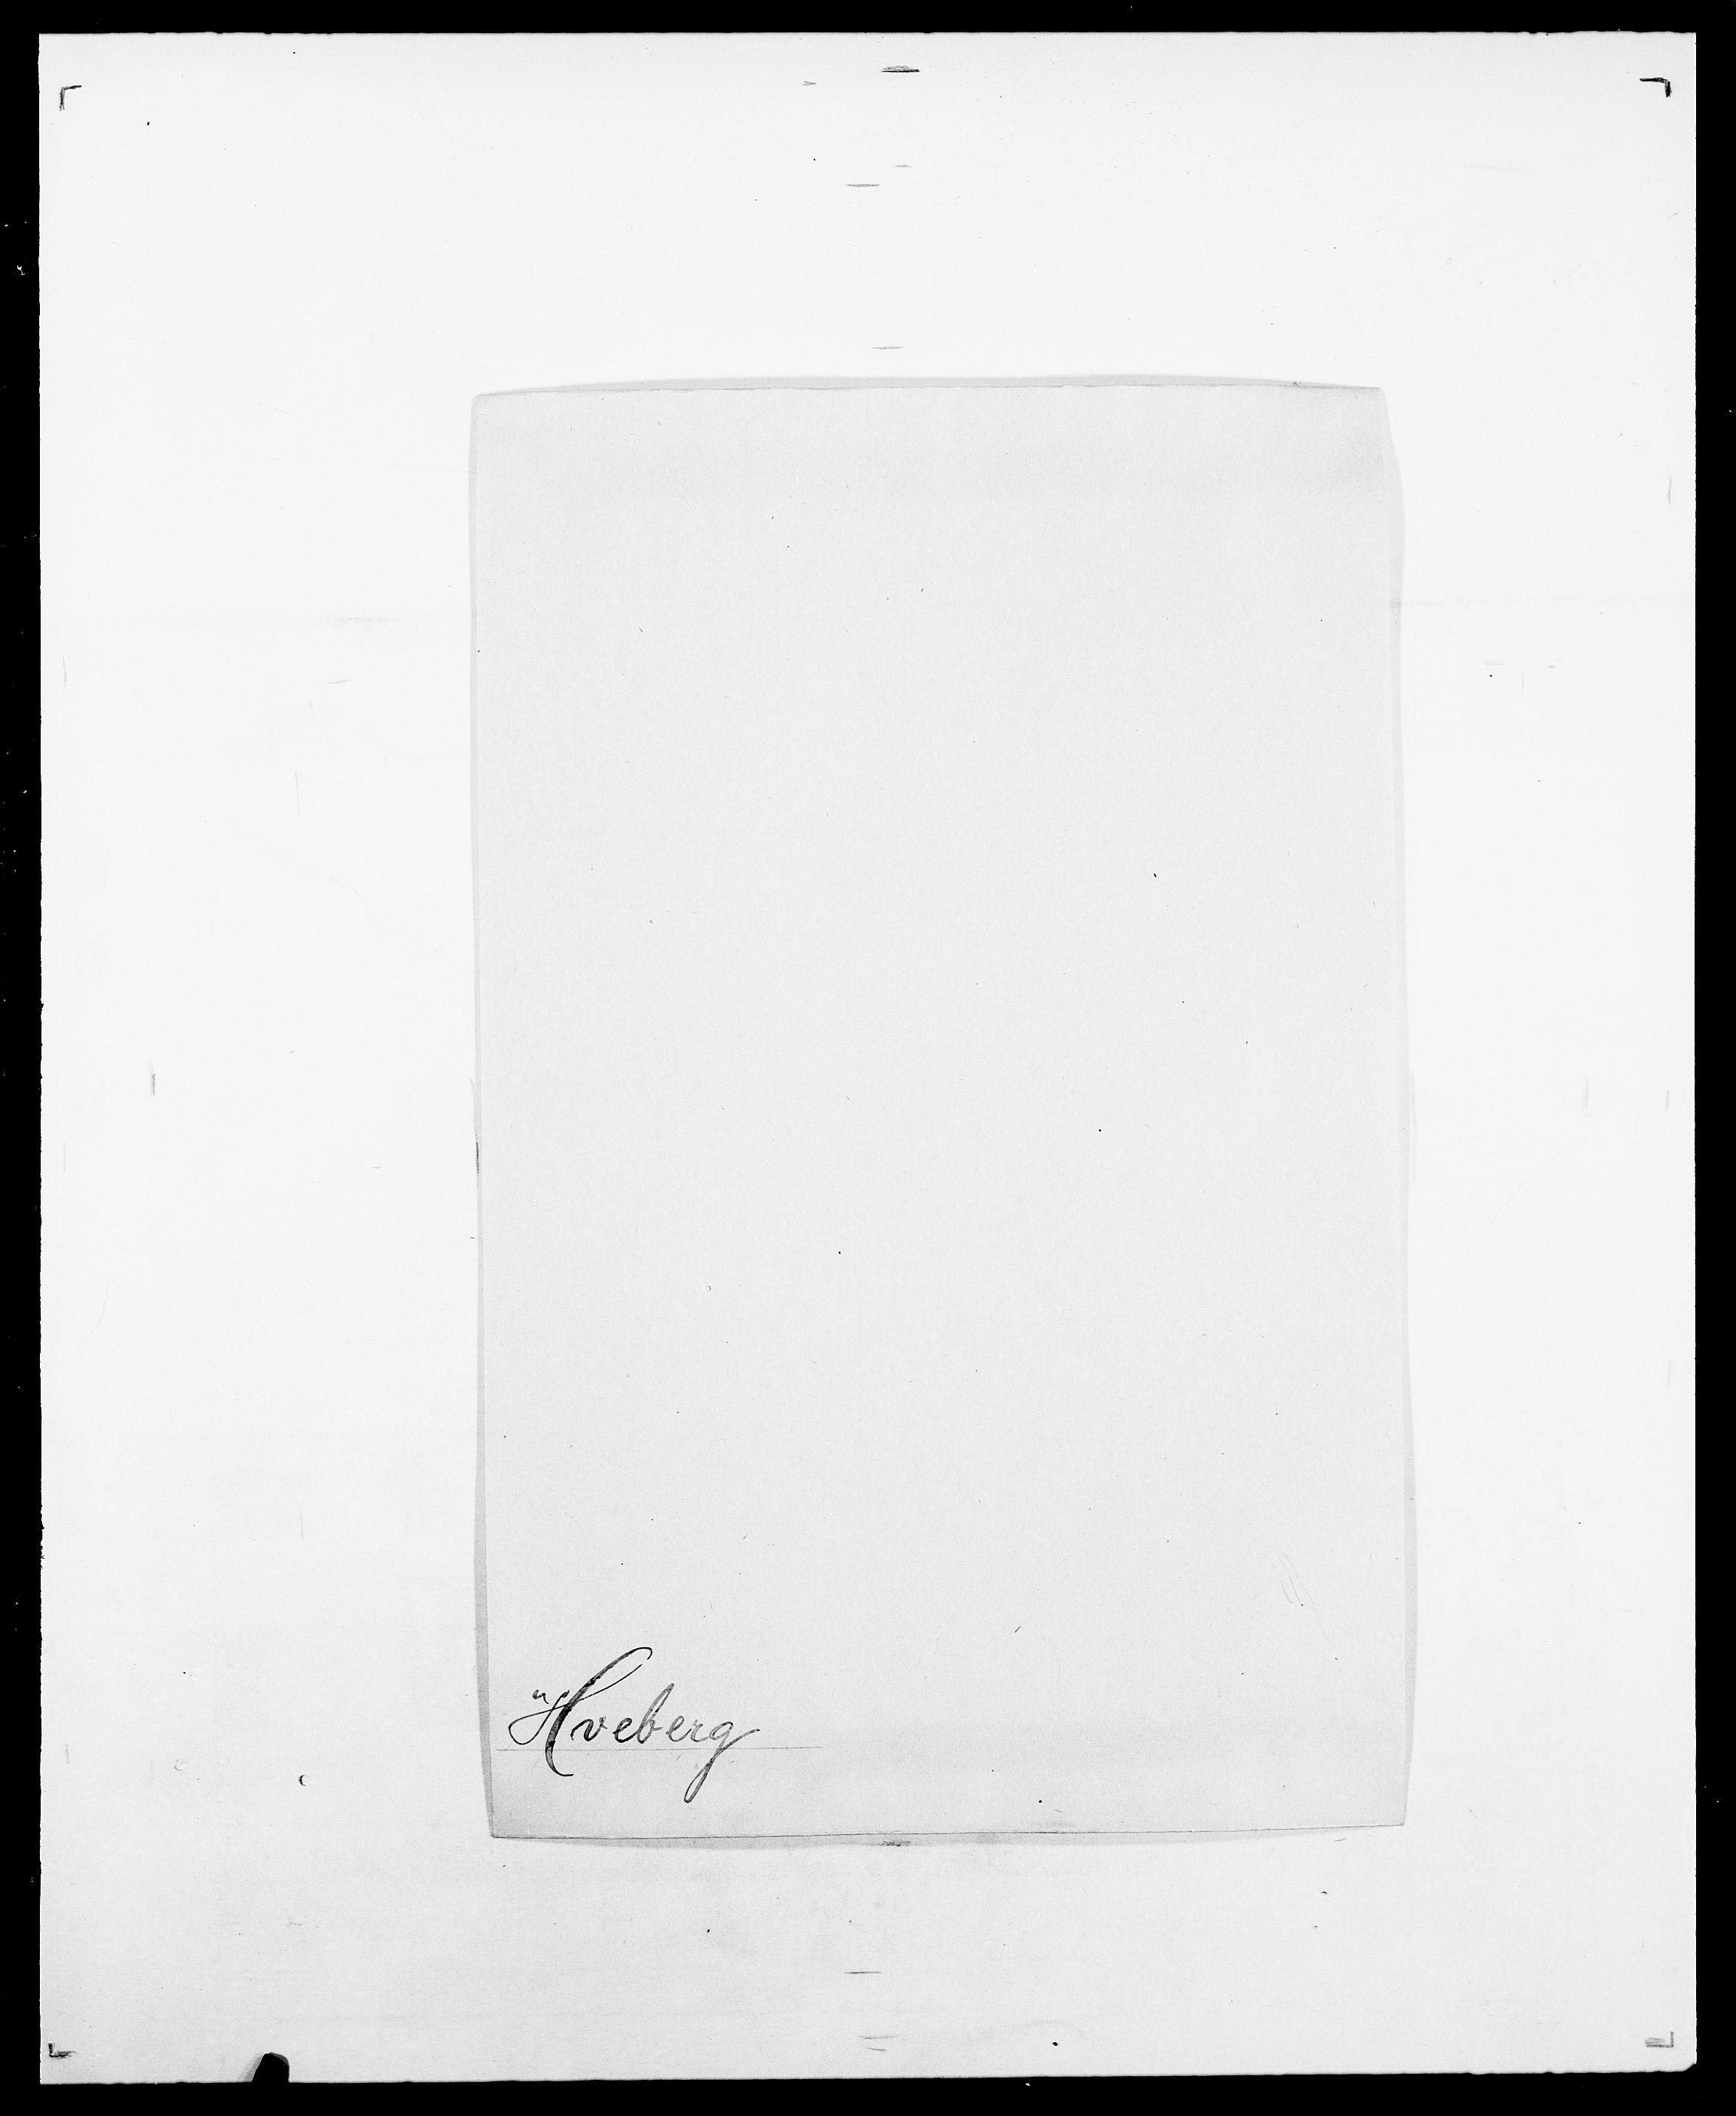 SAO, Delgobe, Charles Antoine - samling, D/Da/L0019: van der Hude - Joys, s. 131